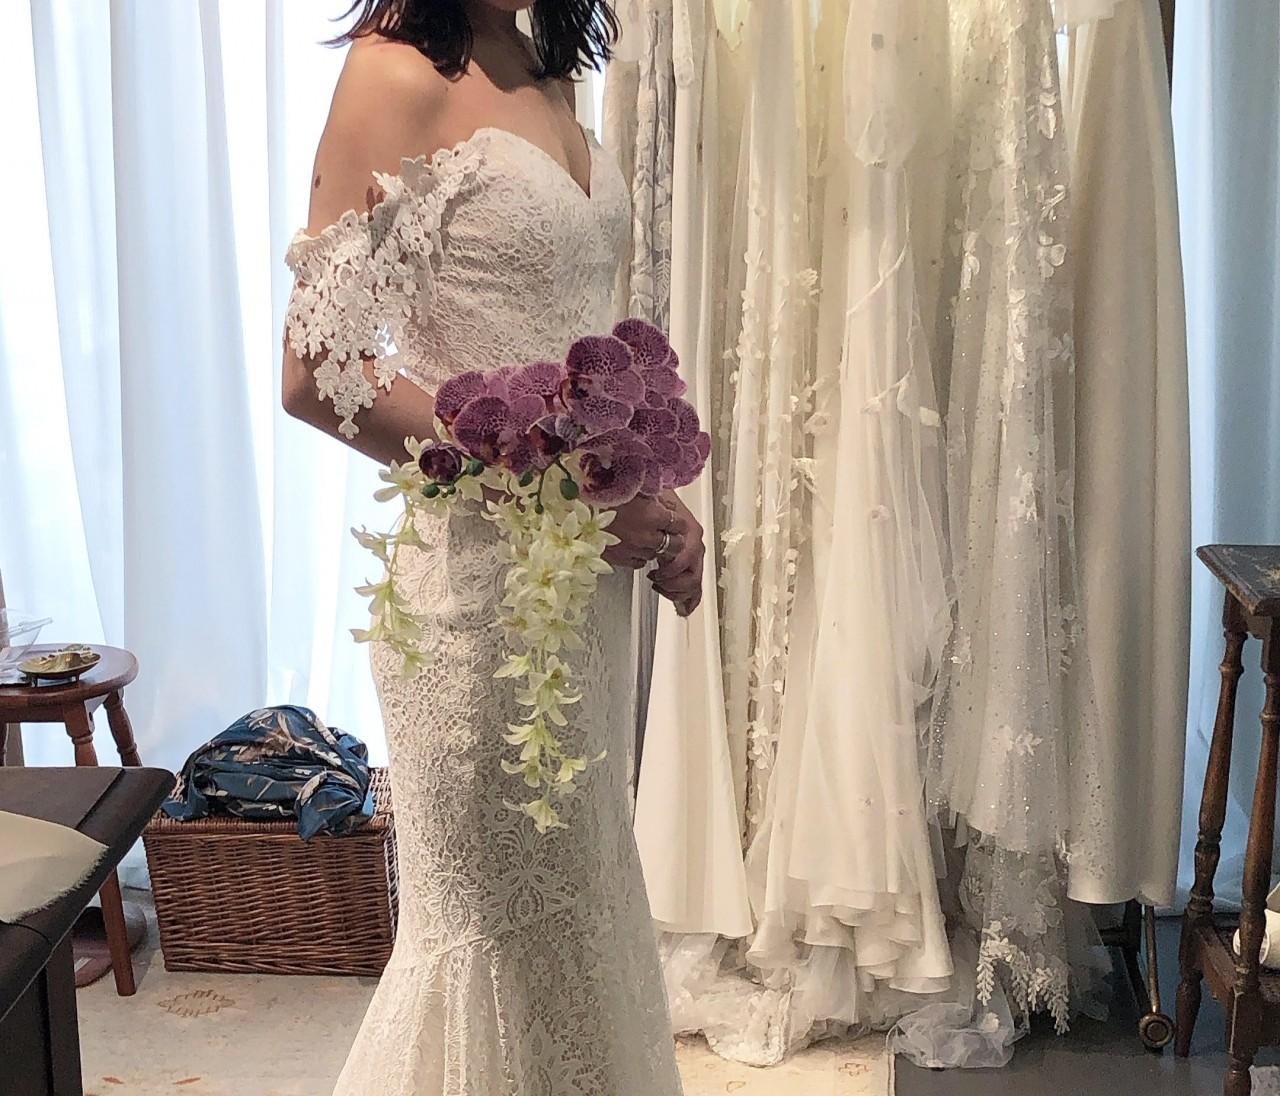 【Wedding】ドレス試着すべて見せます♡/前半